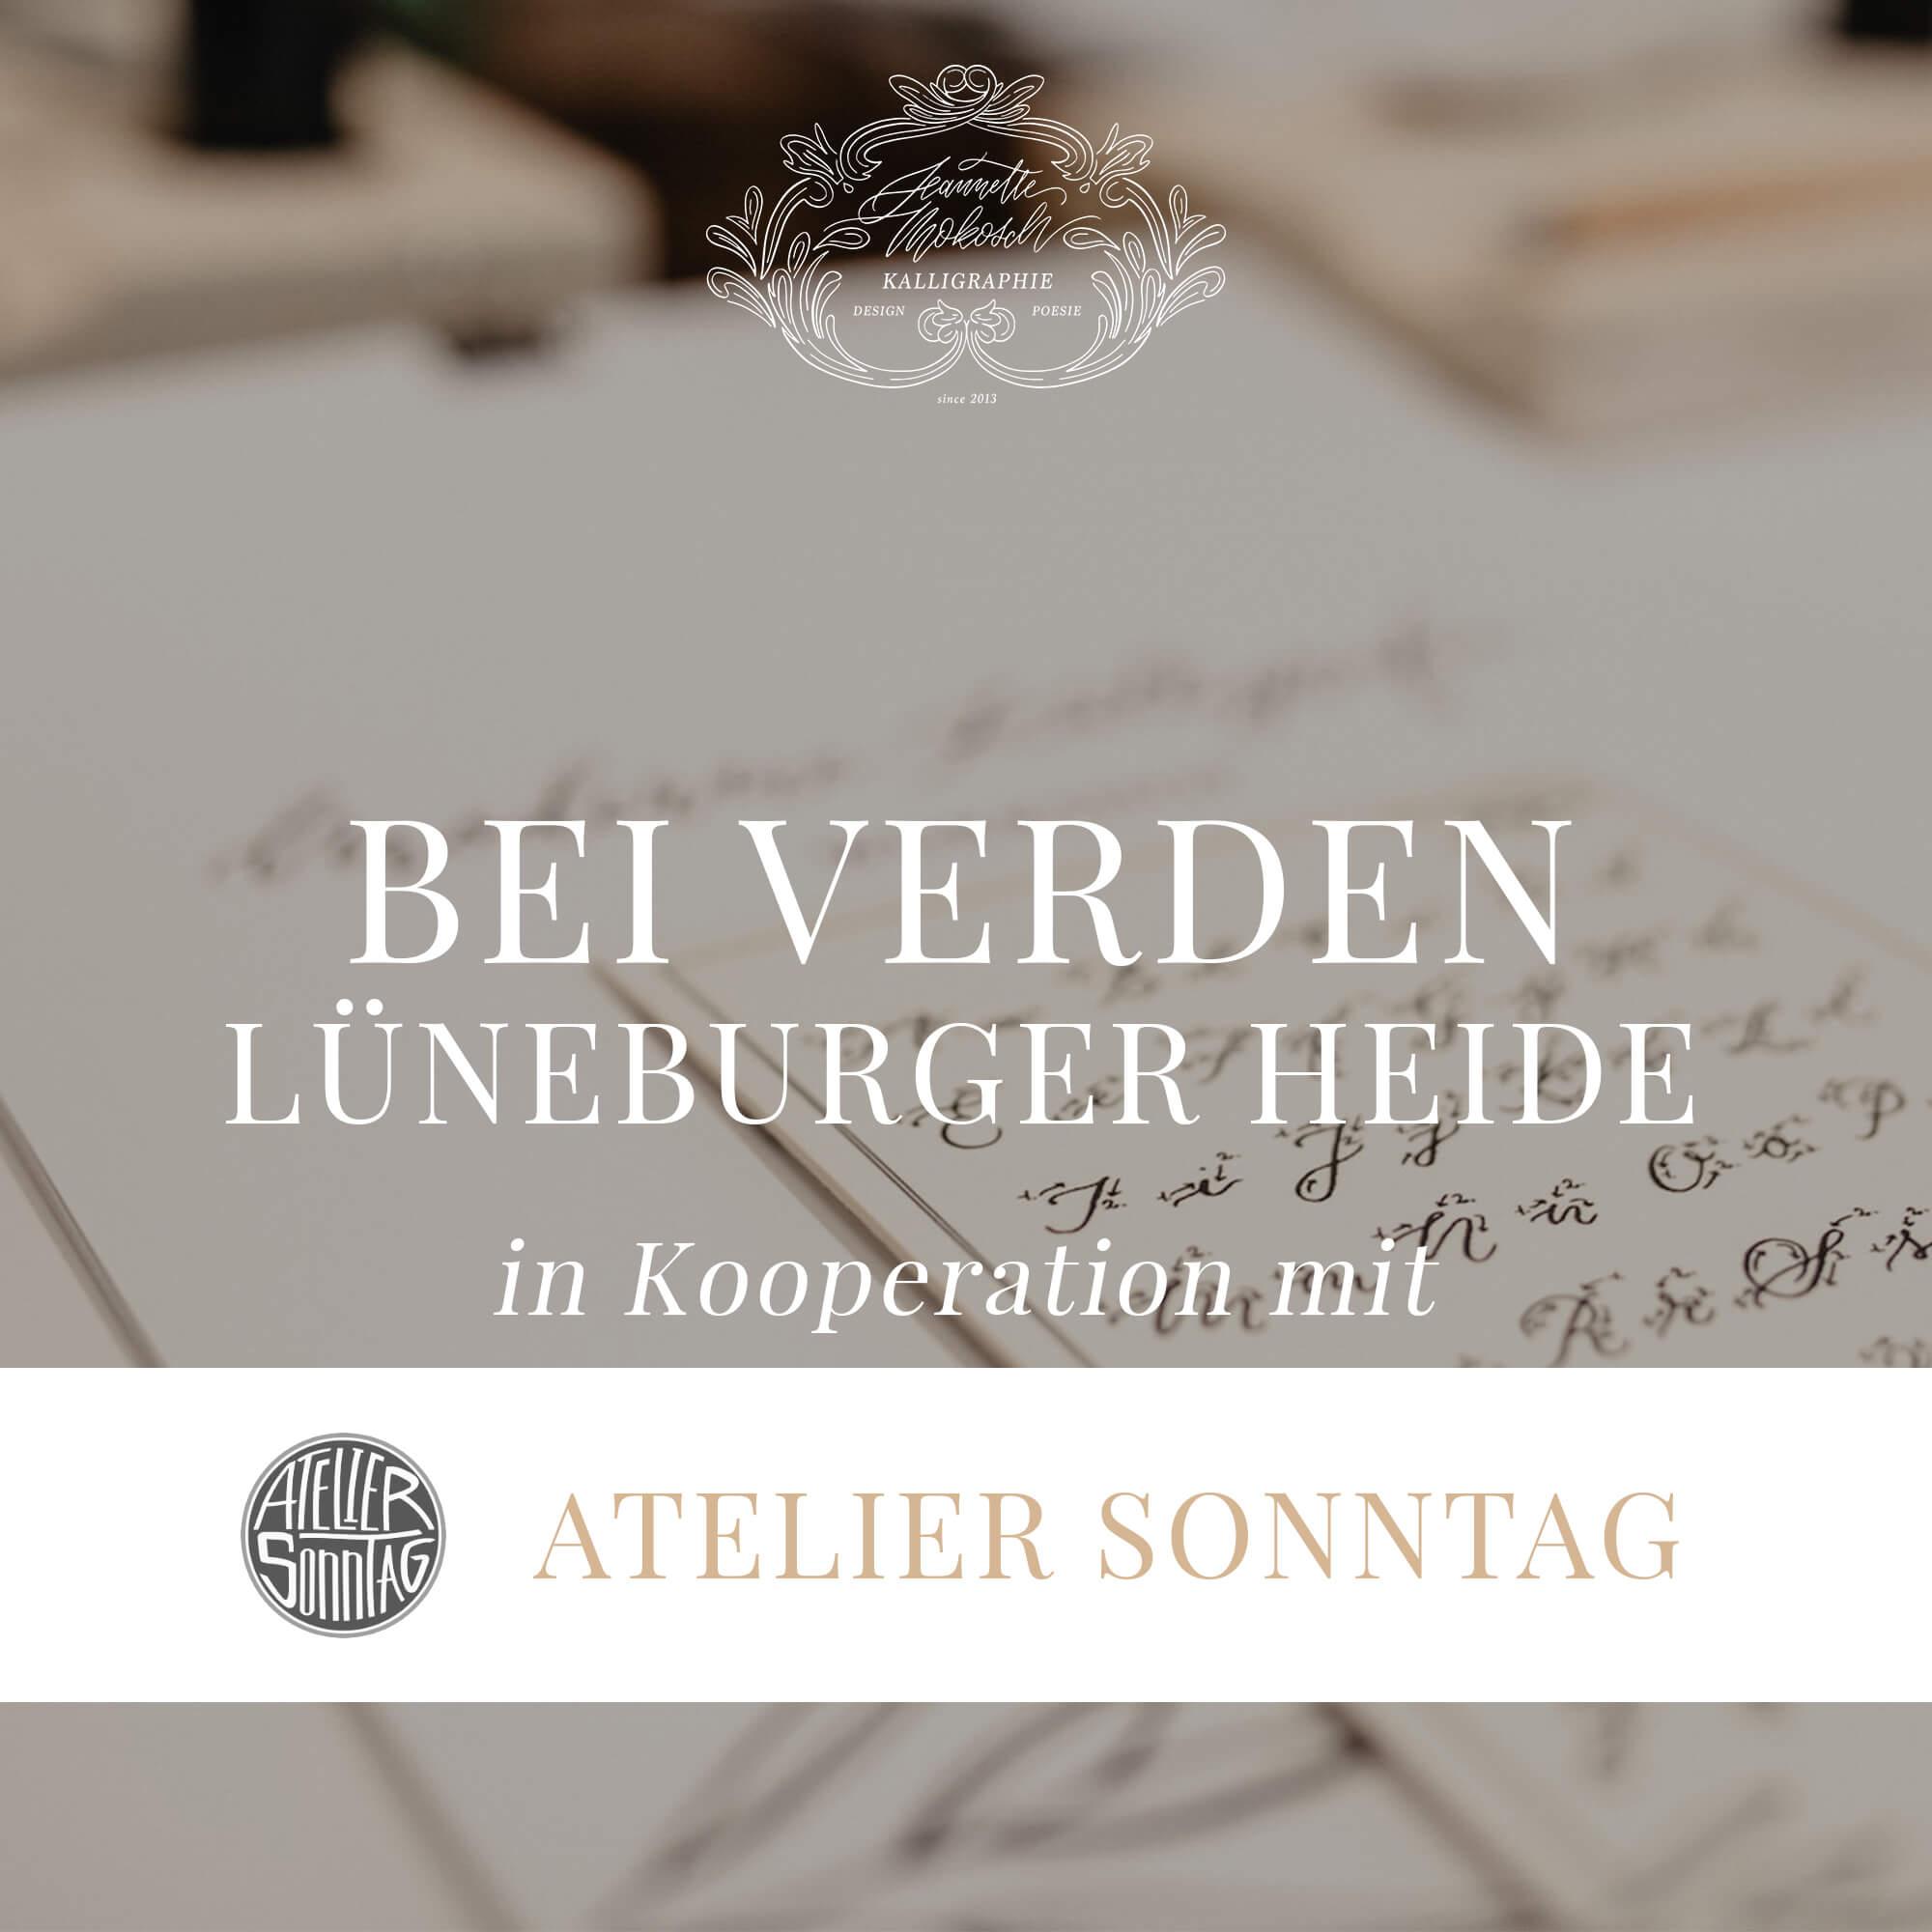 Workshop Kalligraphie Kurs Anfänger Verden Atelier Sonntag Hannover Lüneburger Heide Kalligrafie Hand Lettering Brushlettering Schönschrift Buch Füller Feder Moderne Kalligrafie